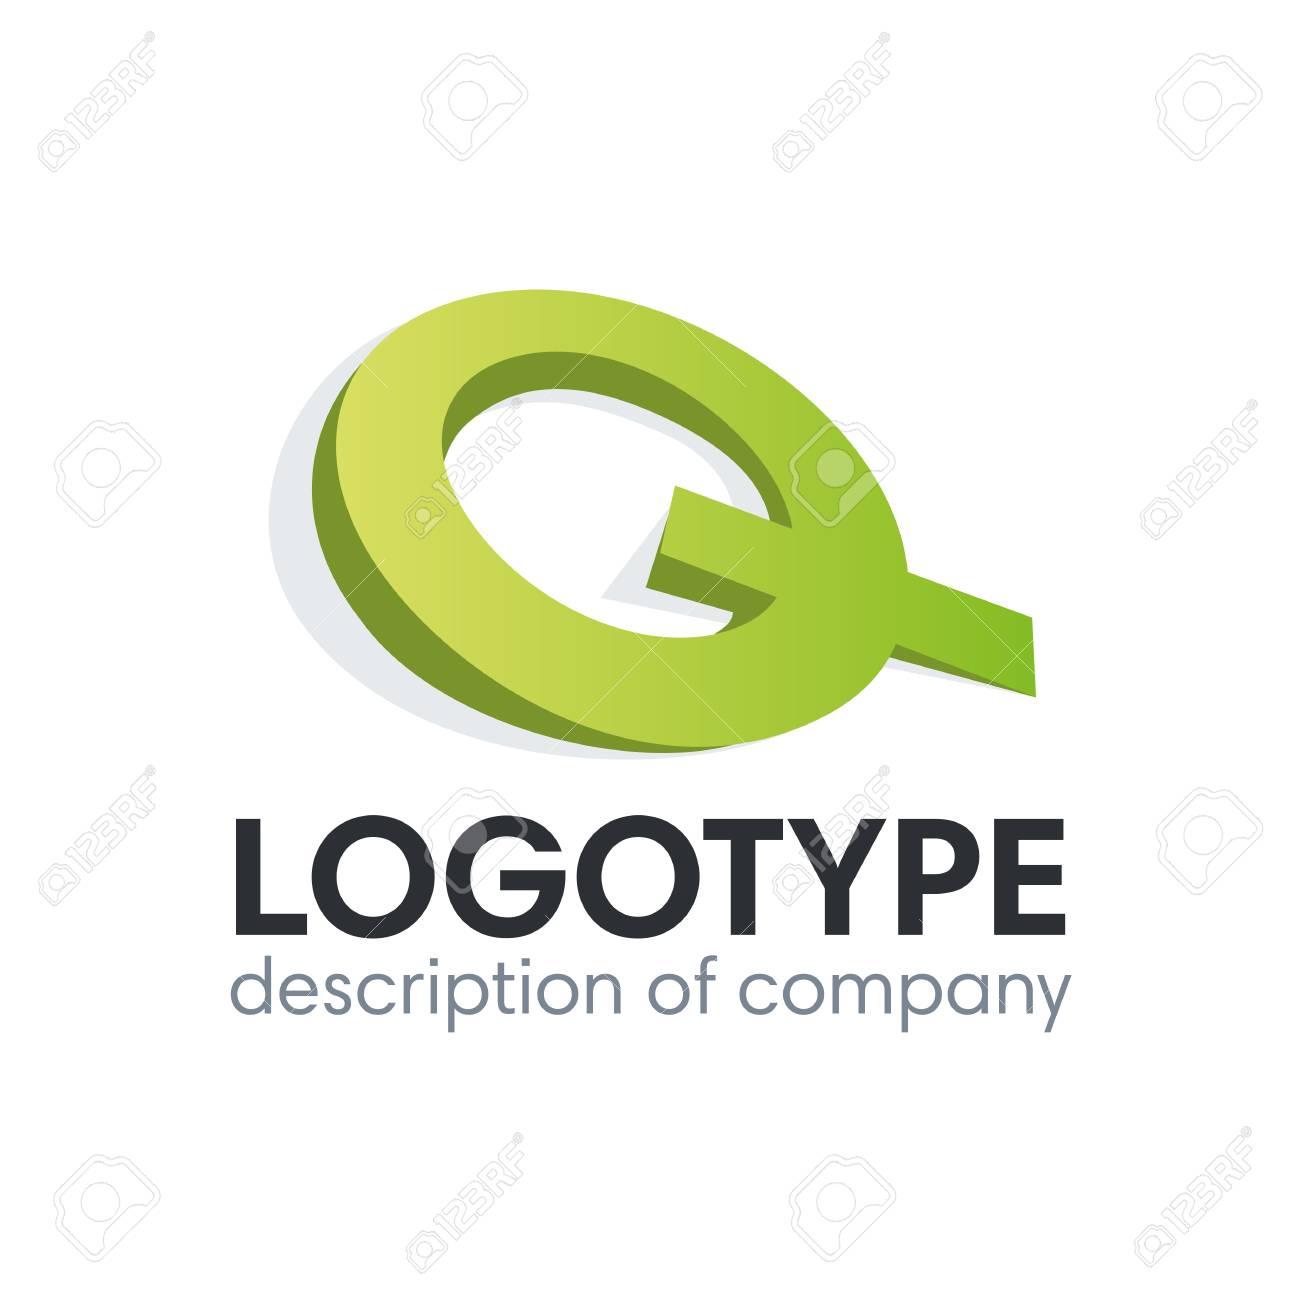 Letter Q logo icon design template elements - 84049338